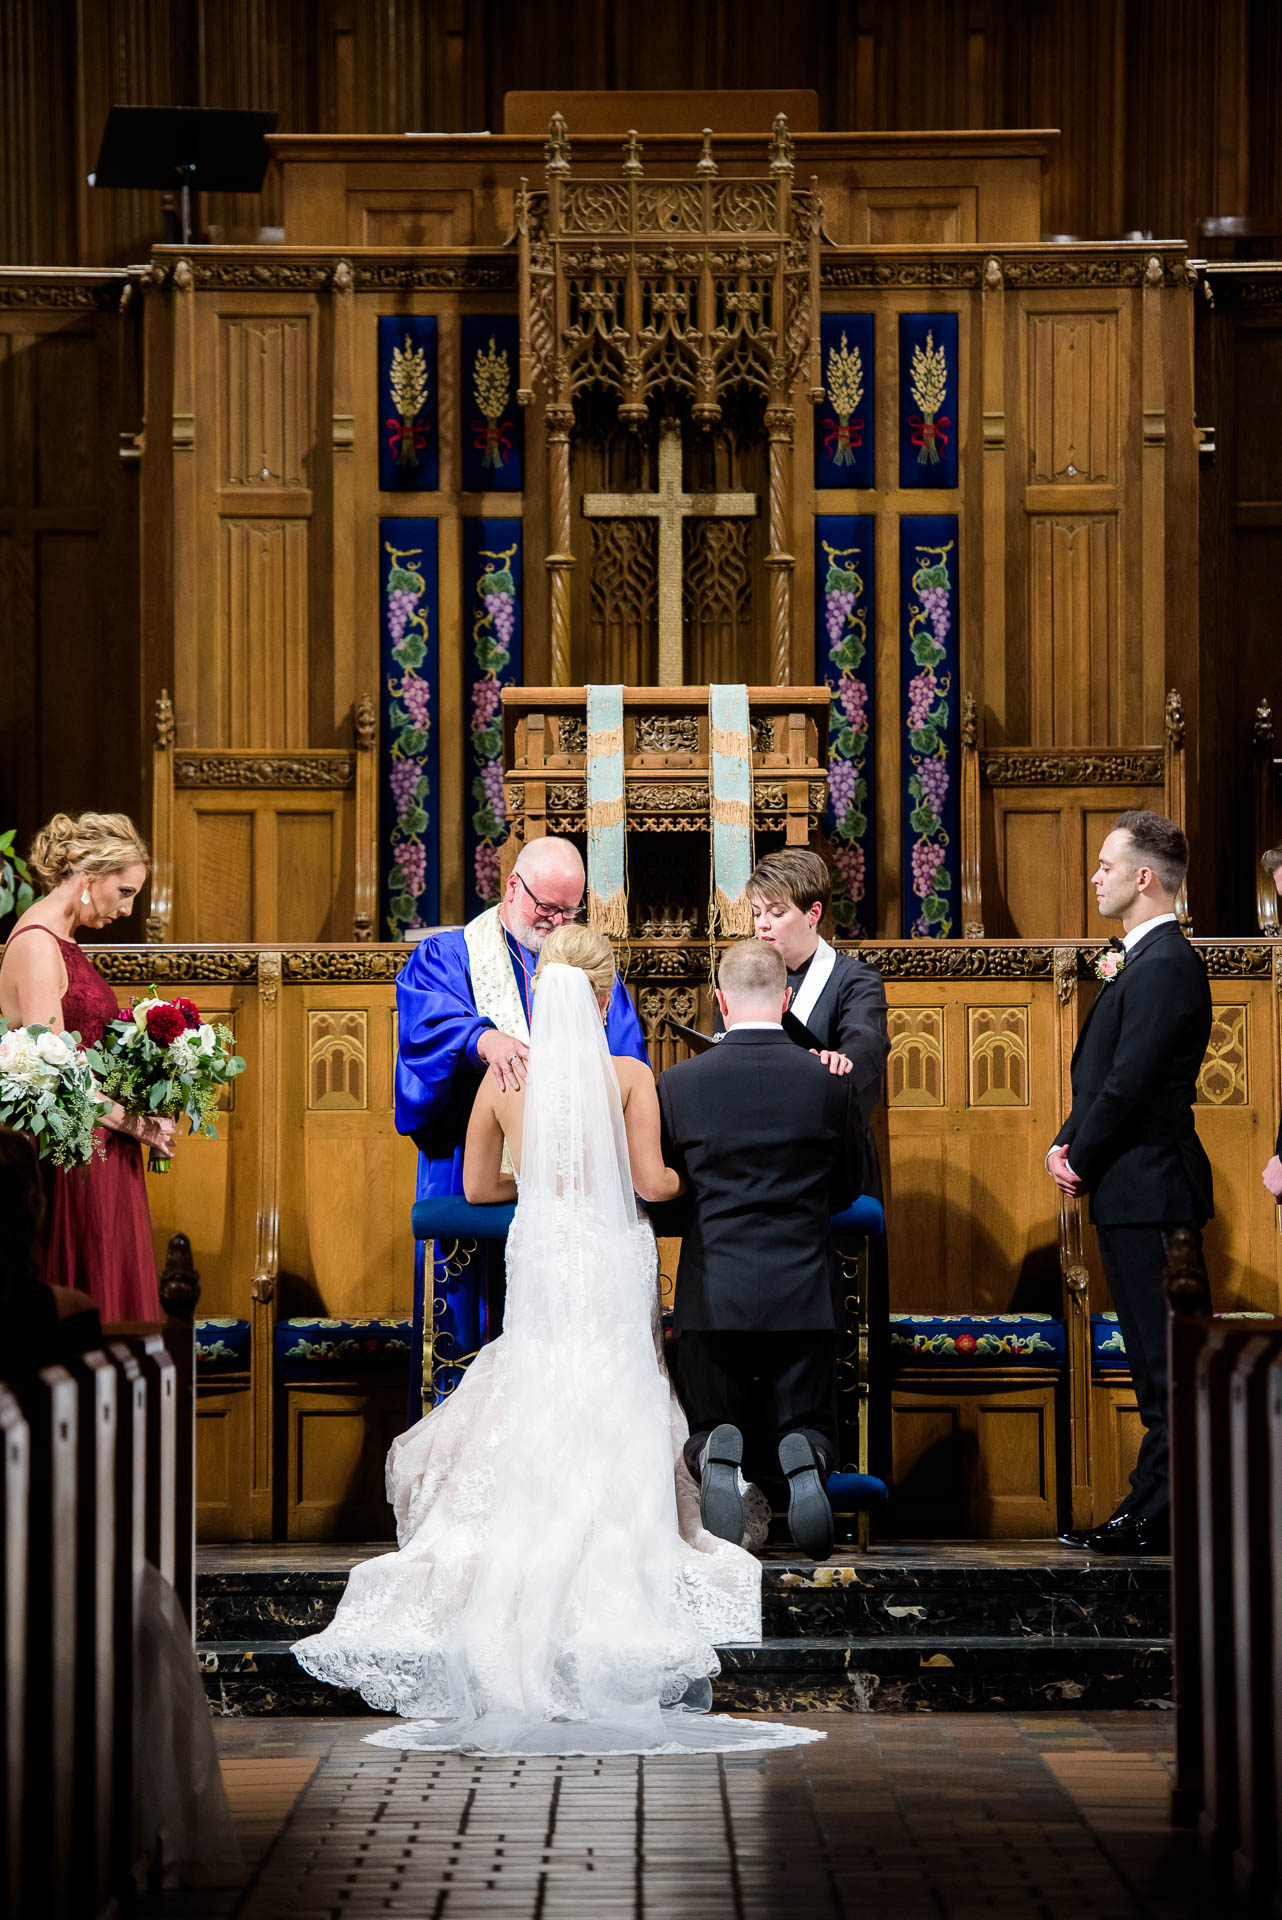 Wedding ceremony at Fourth Presbyterian Church in Chicago.